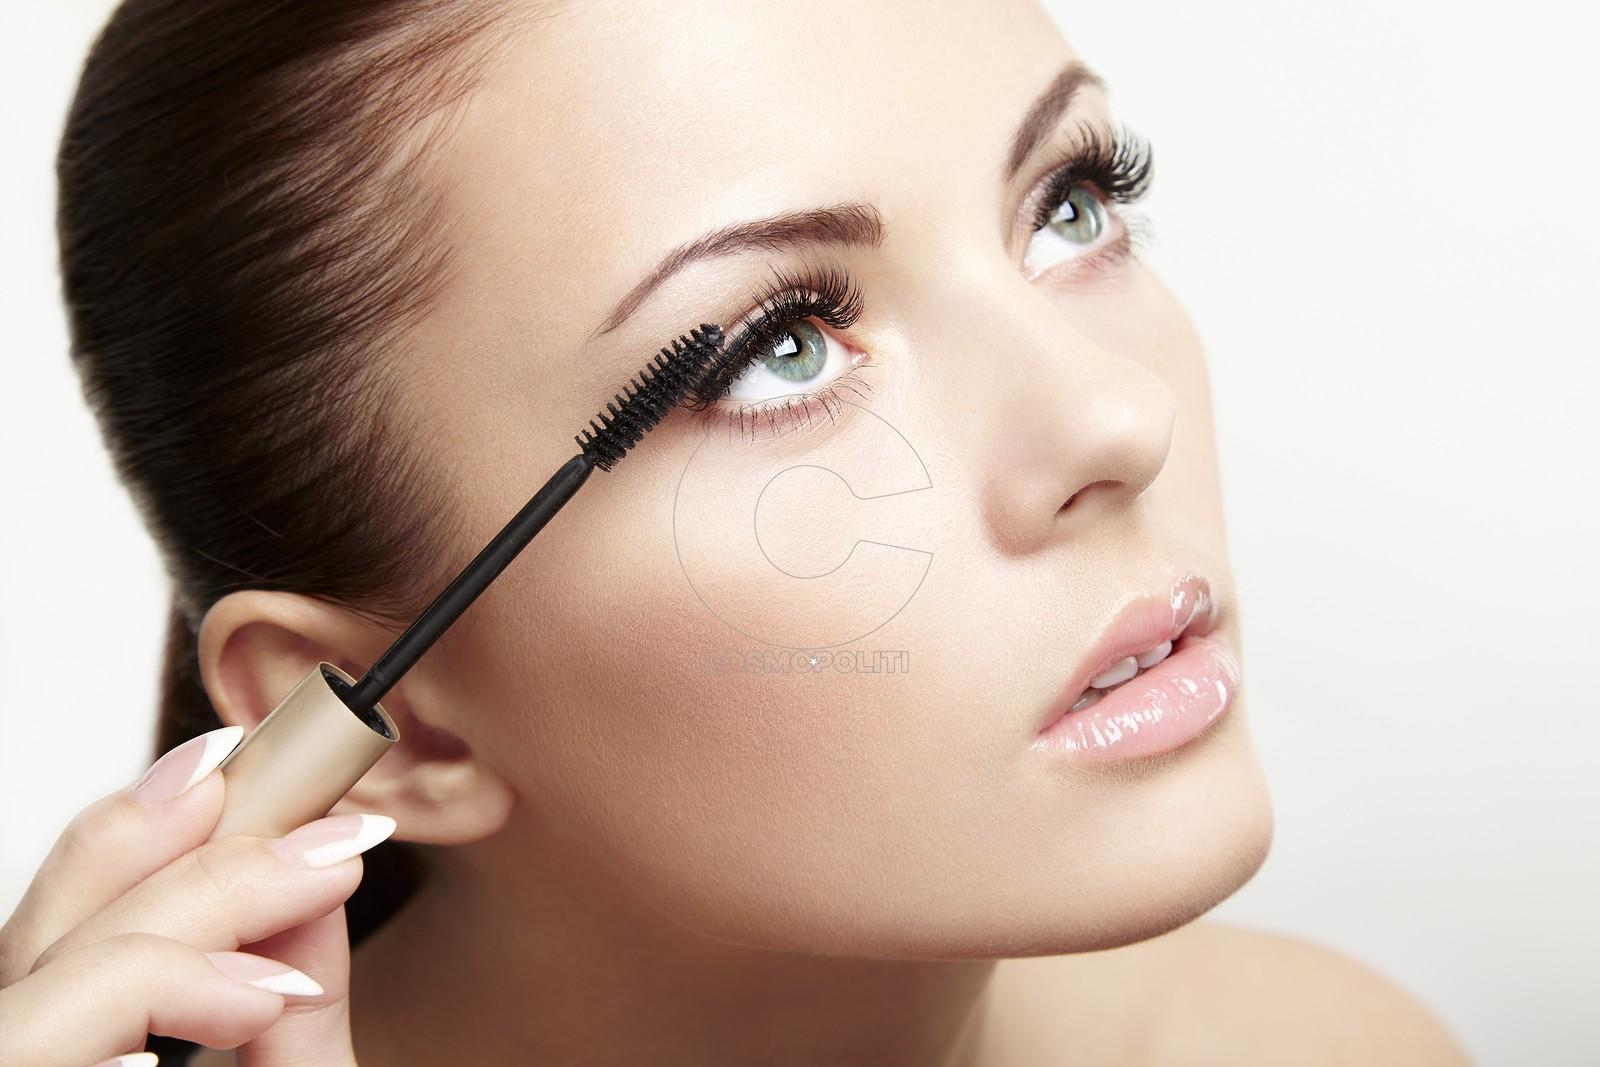 bigstock-Beautiful-Woman-Face-Perfect-44236741